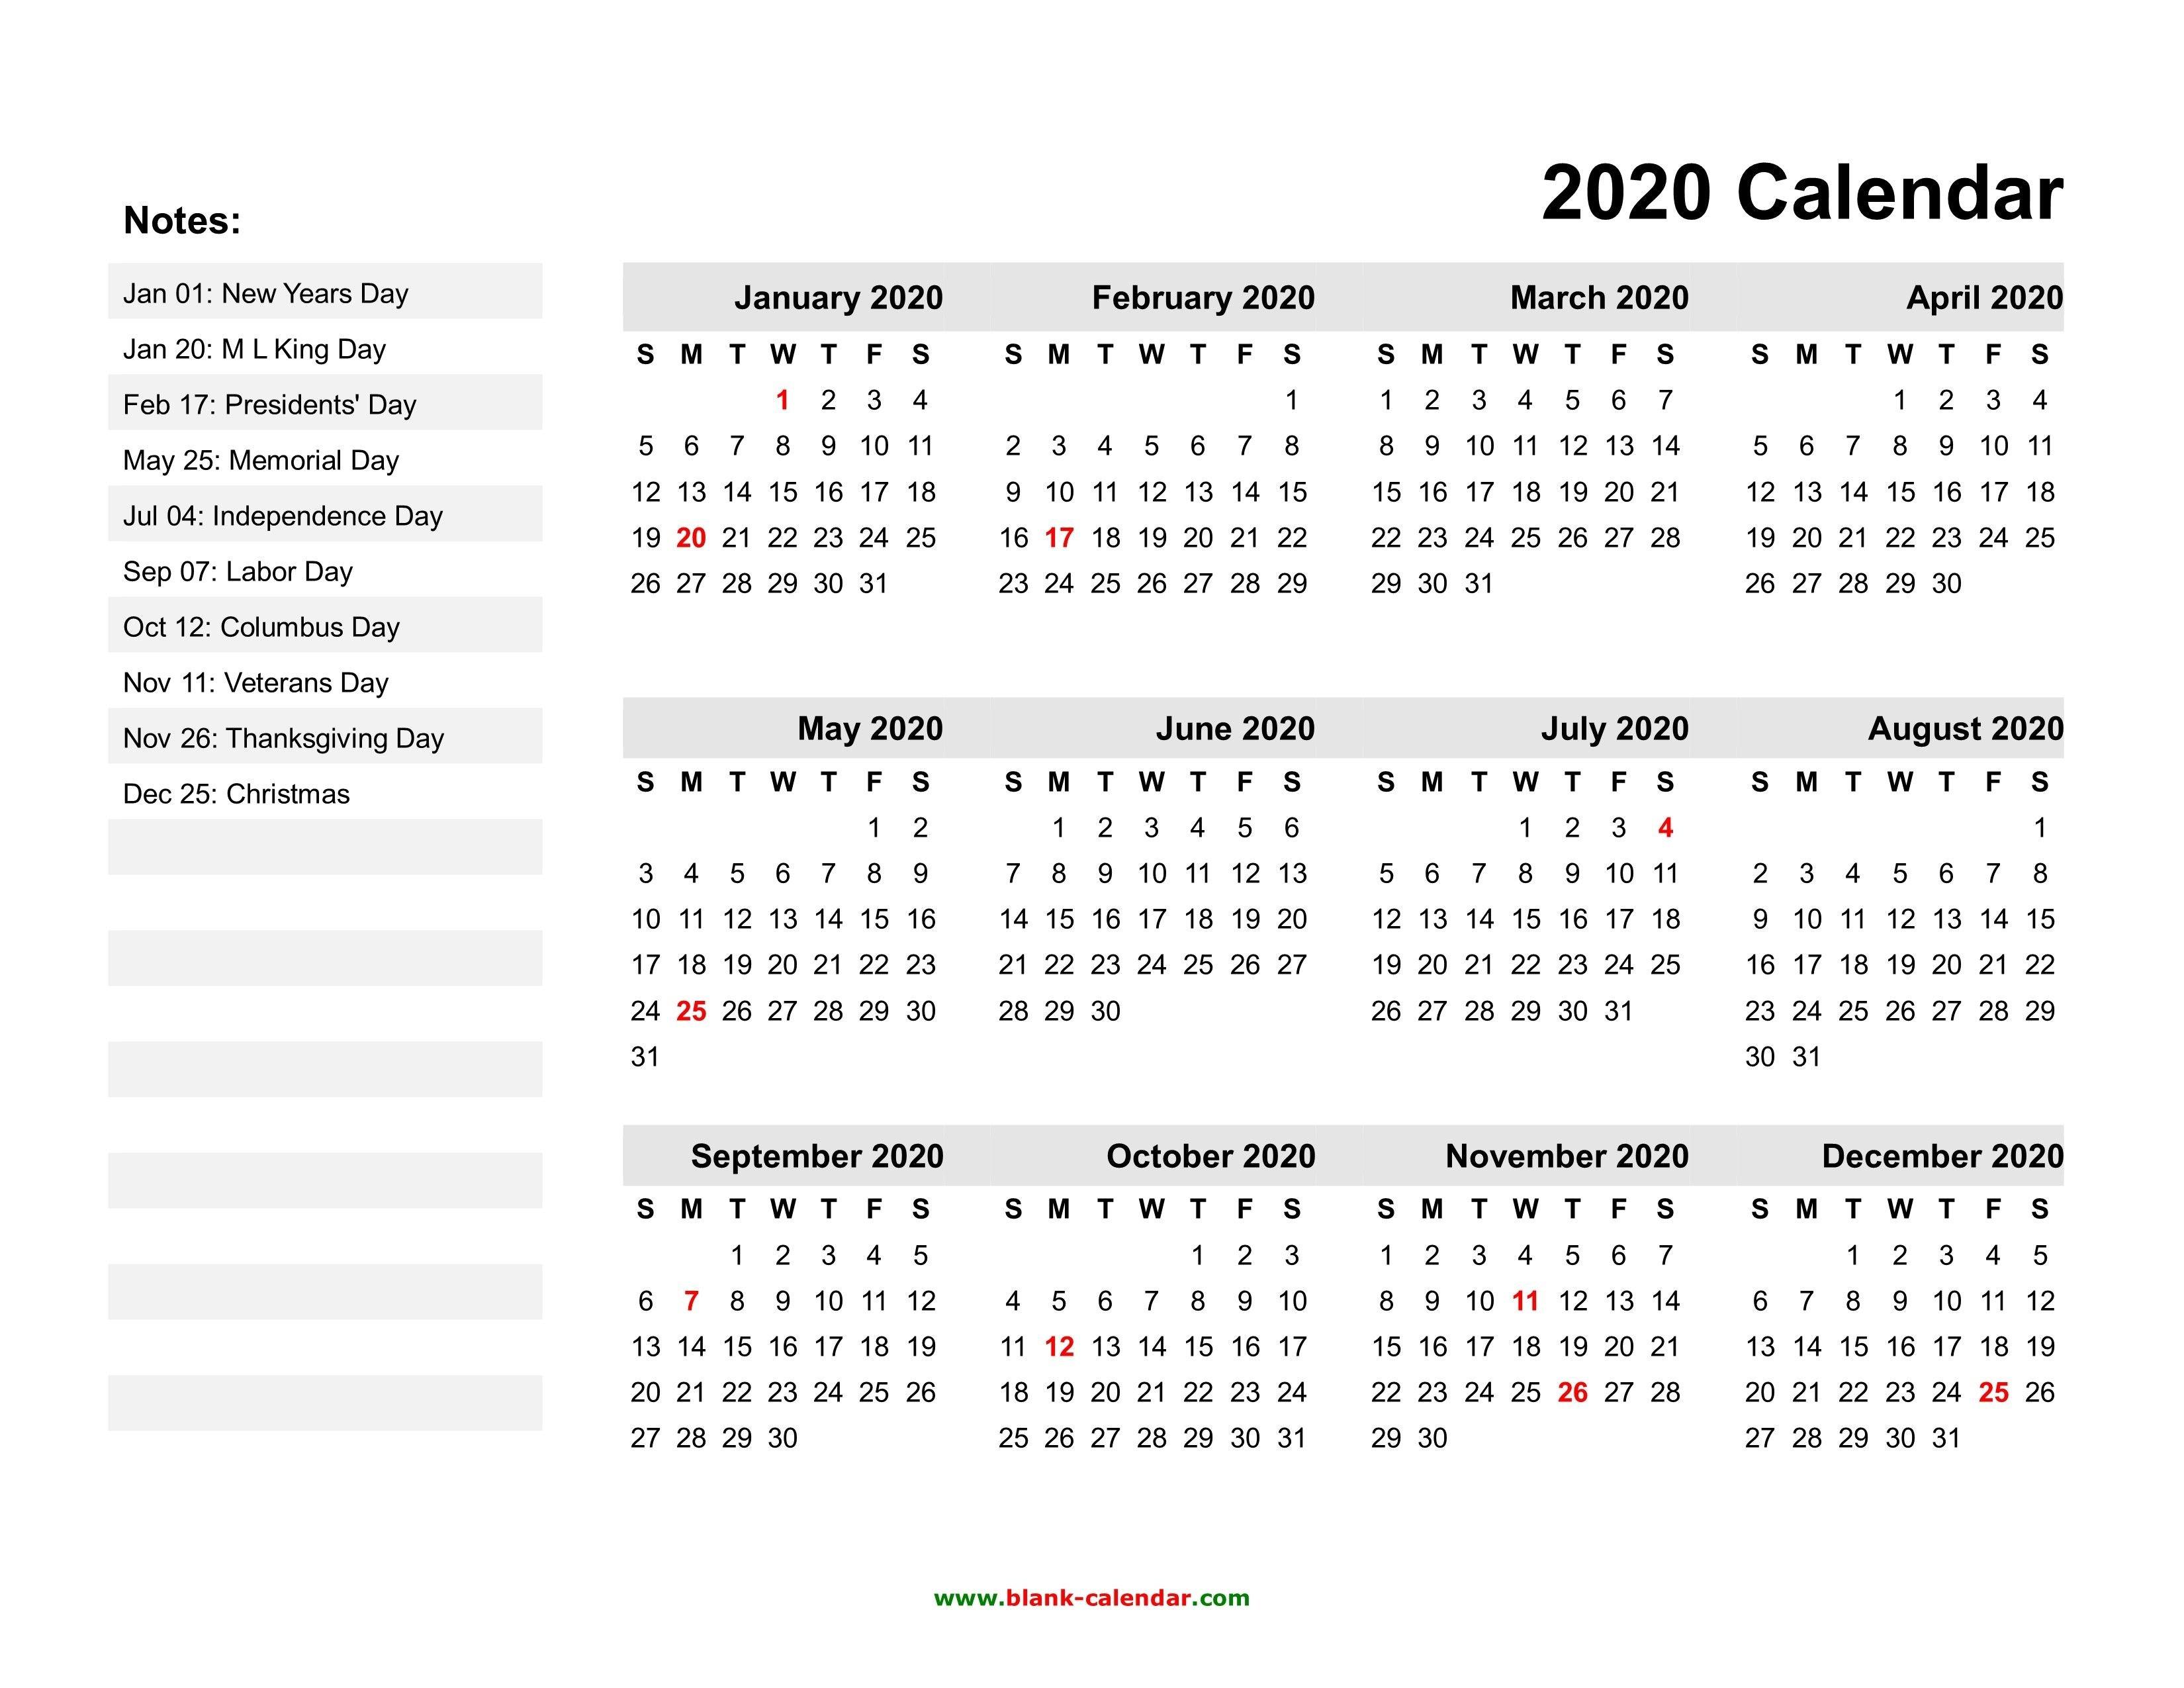 Free Printable 2020 Calendars With Holidays   Printable Printable Calenders With Date And Time On 8 1/2 X 11 Paper